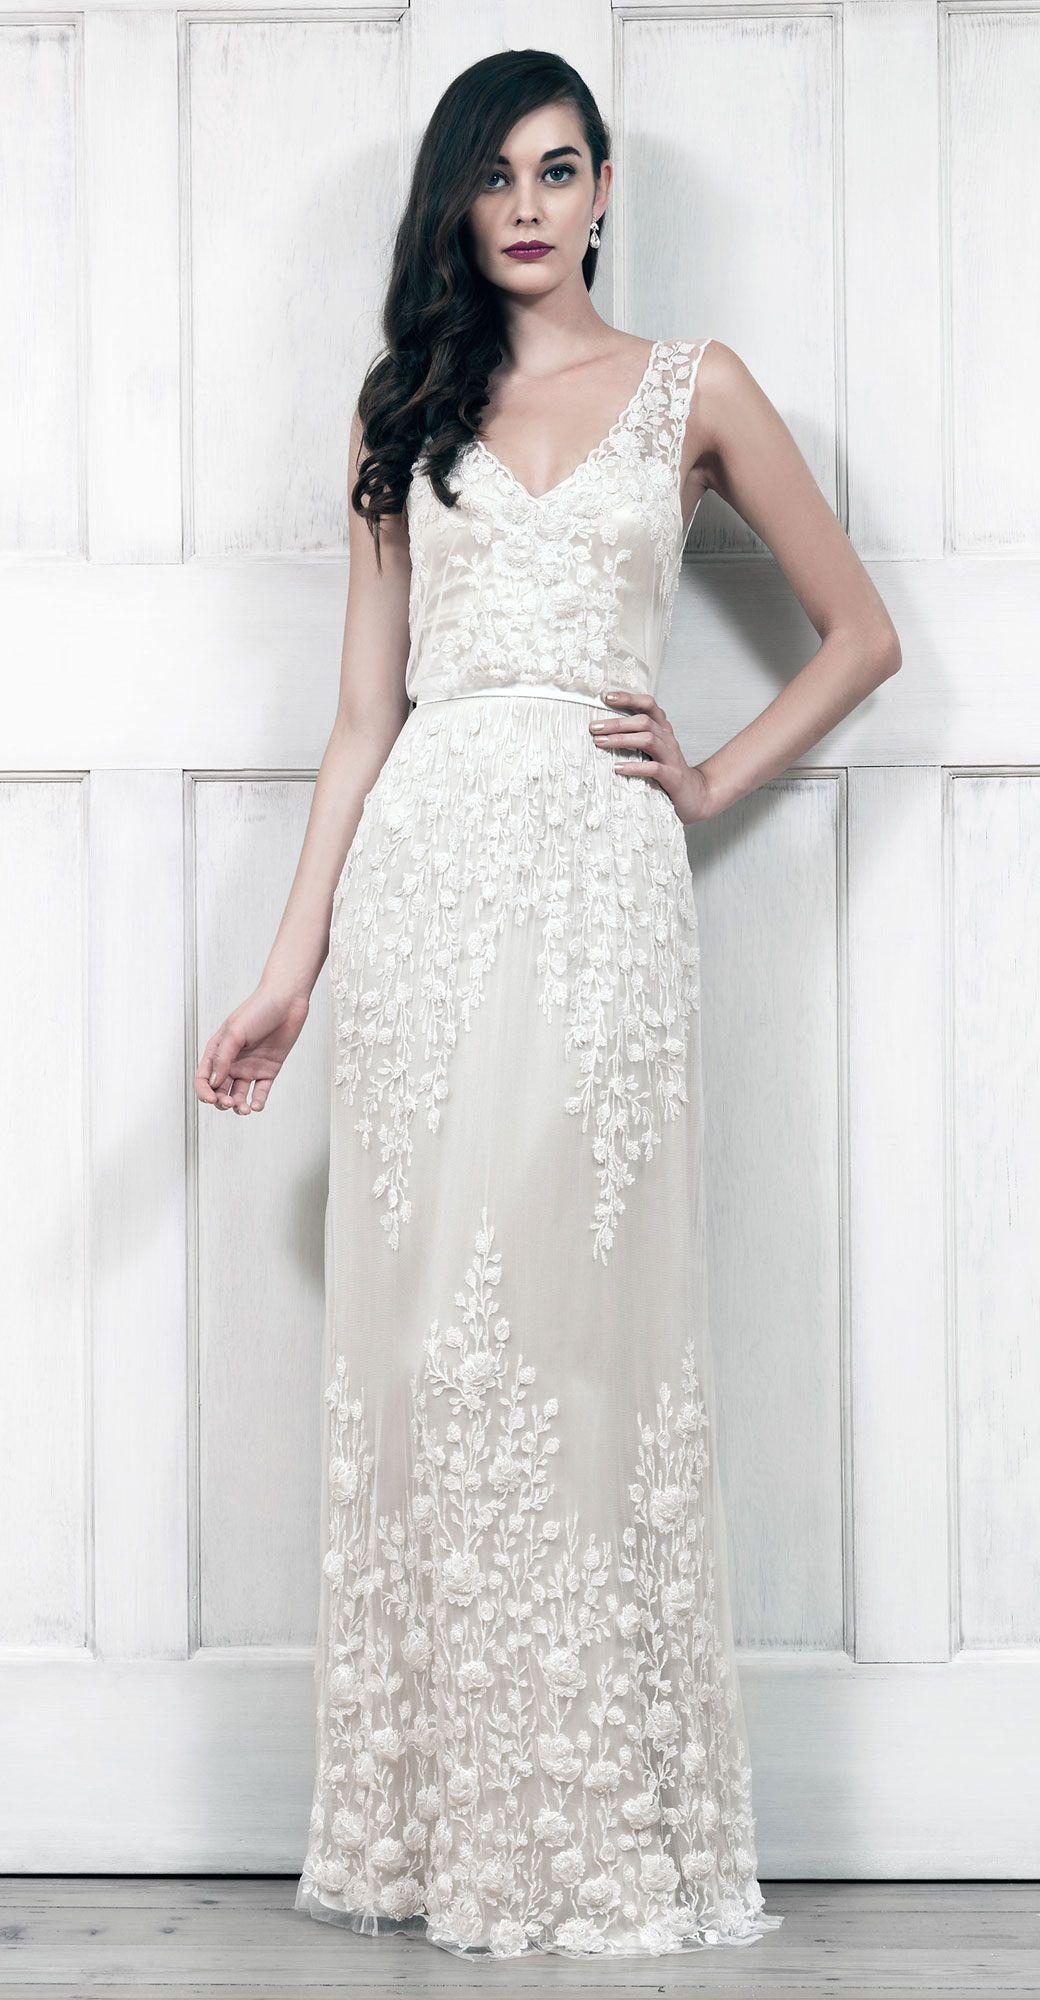 Catherine deane sian boho pinterest beautiful wedding and